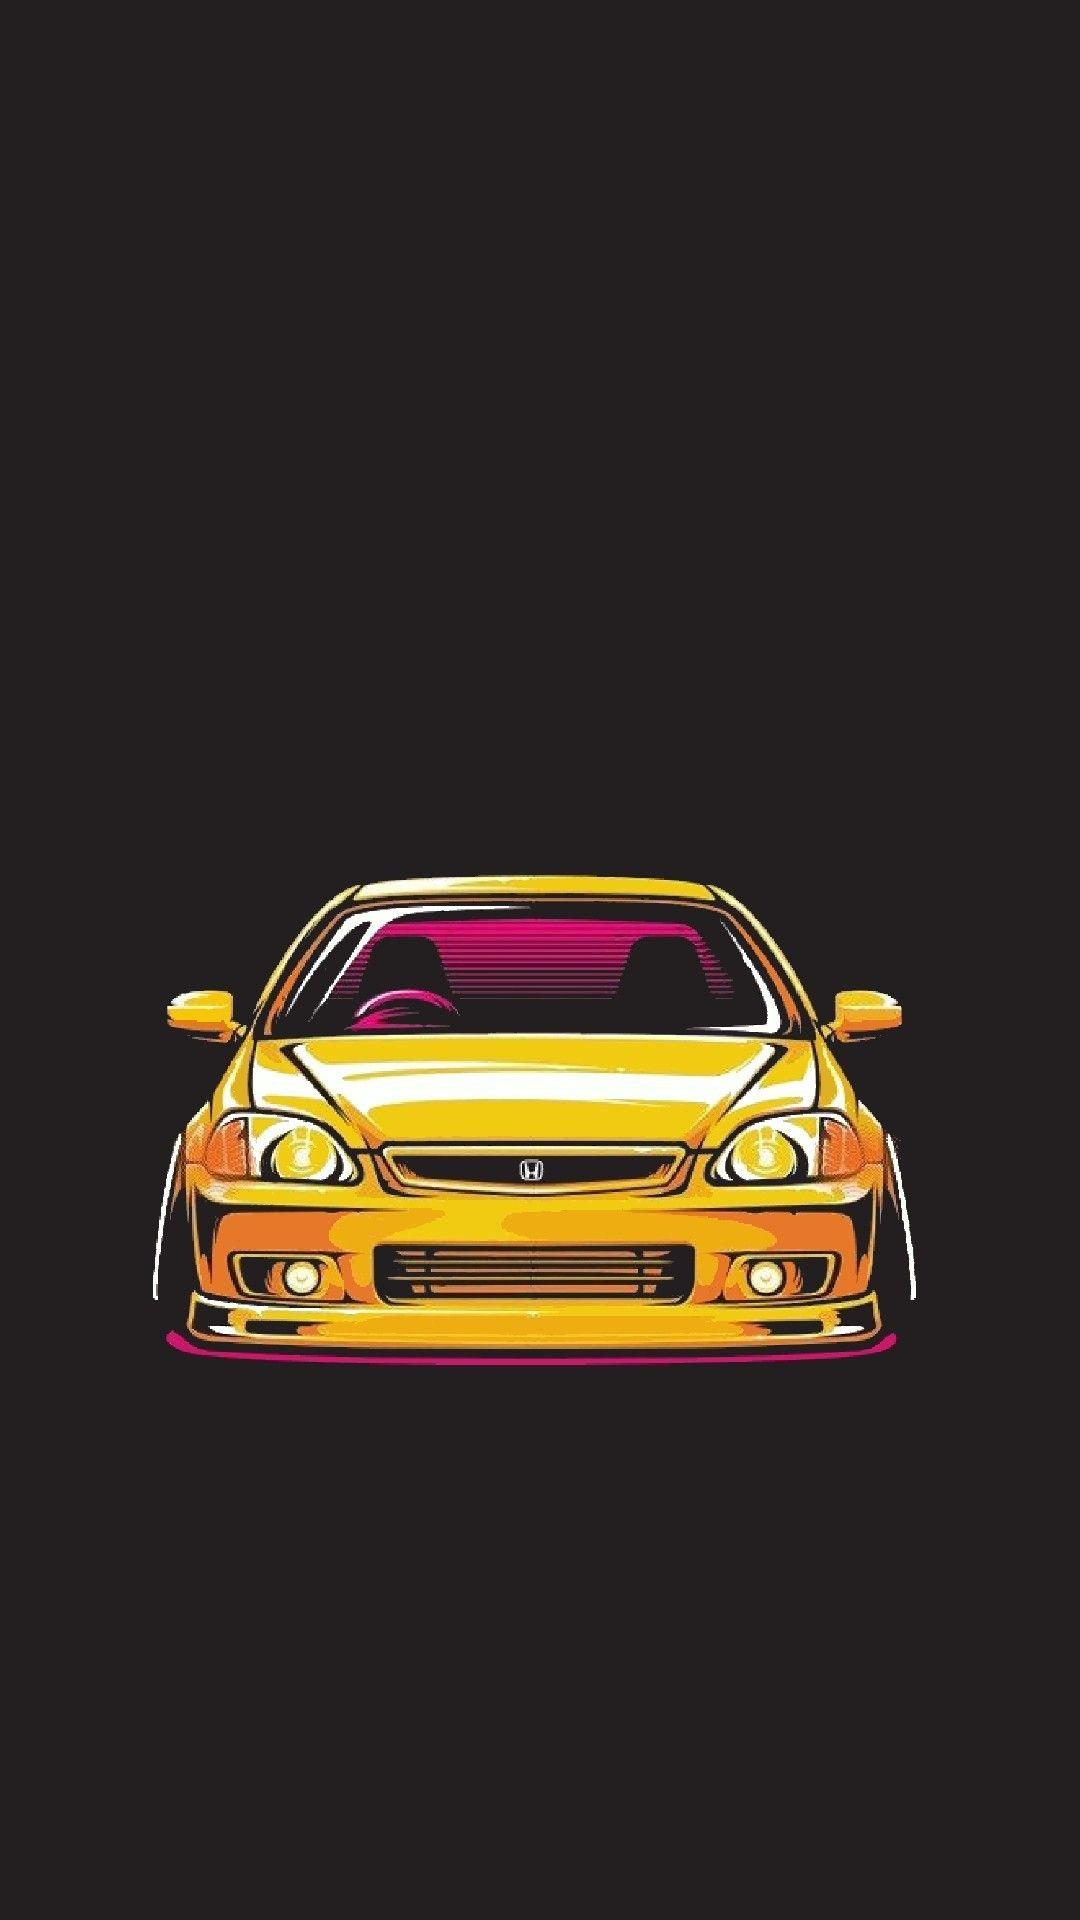 Pin By Marlen Oe On Avto Art Civic Car Honda Civic Jdm Wallpaper